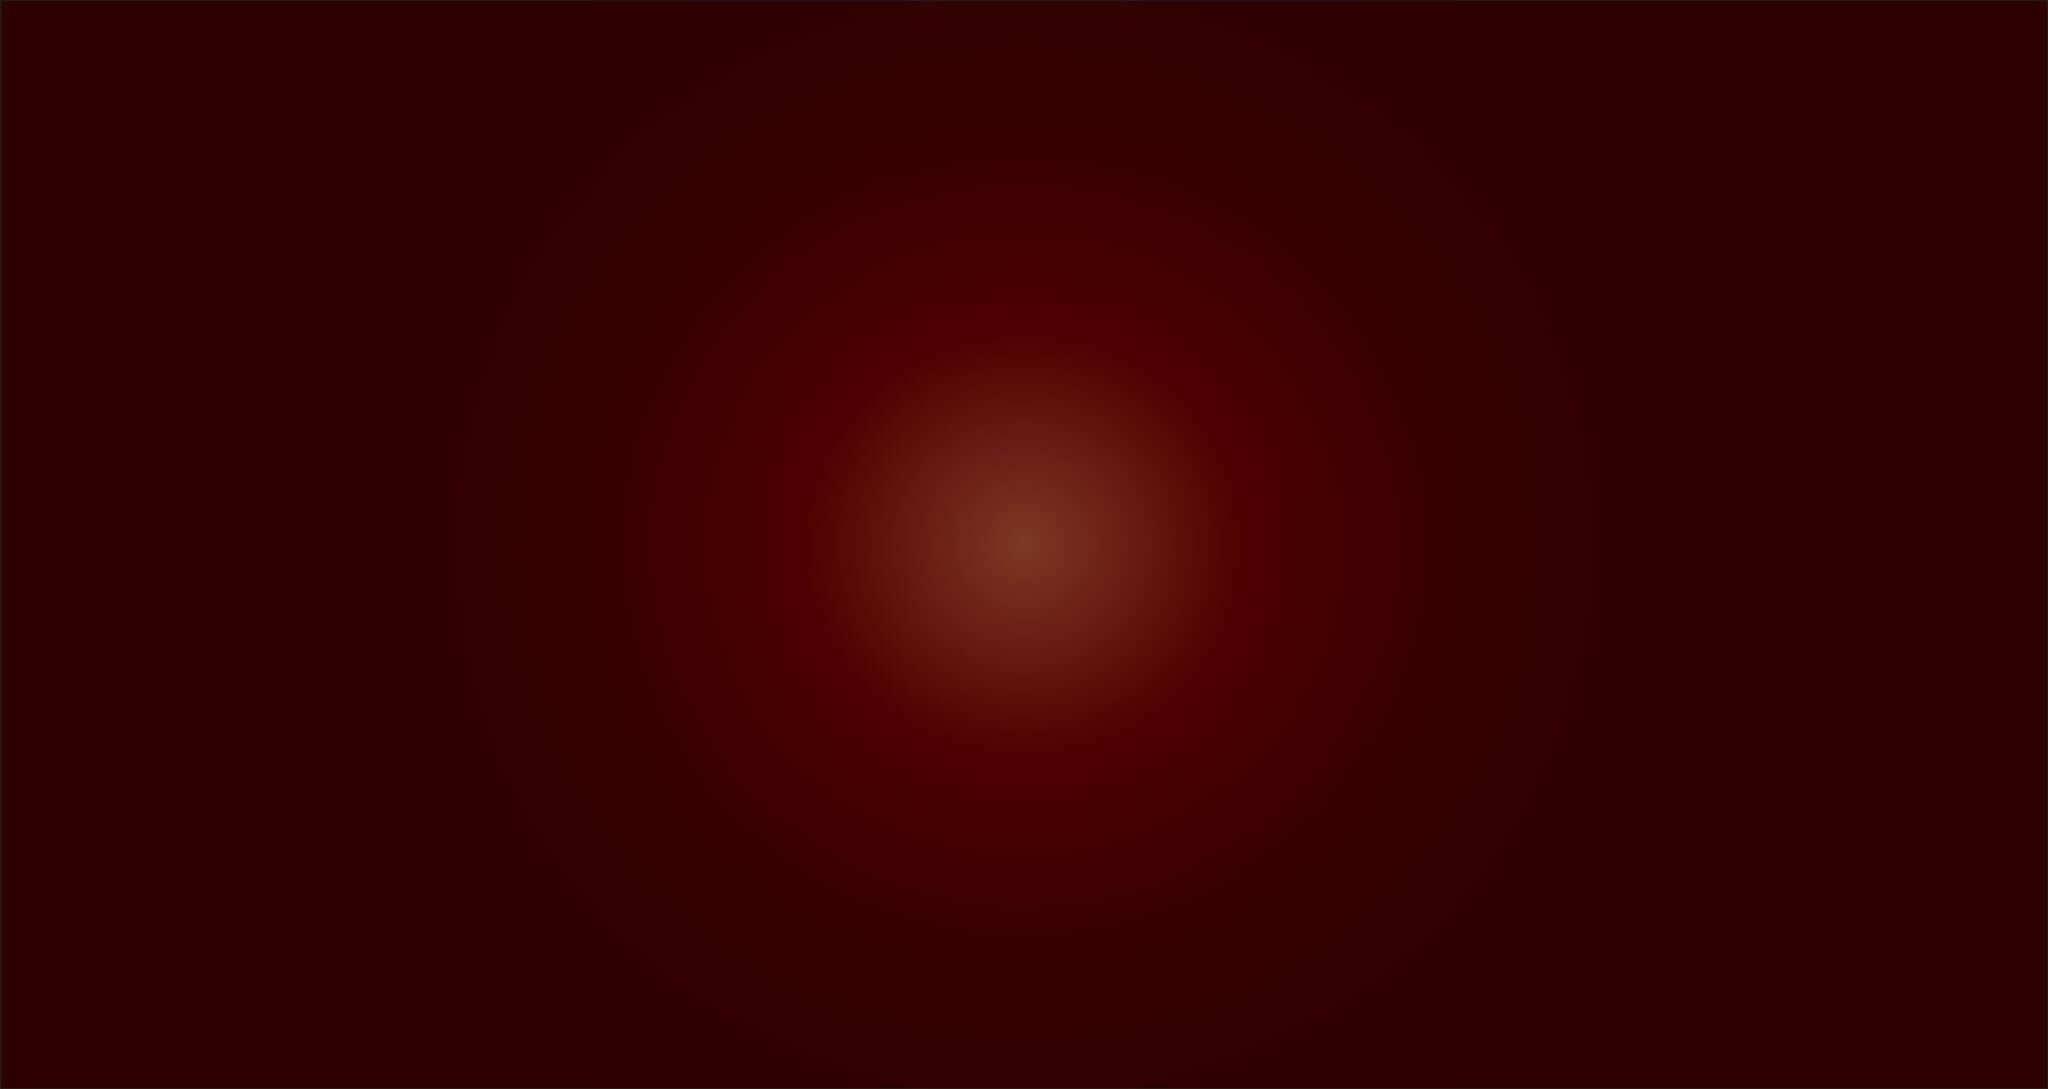 10mfh-background-red1.jpg